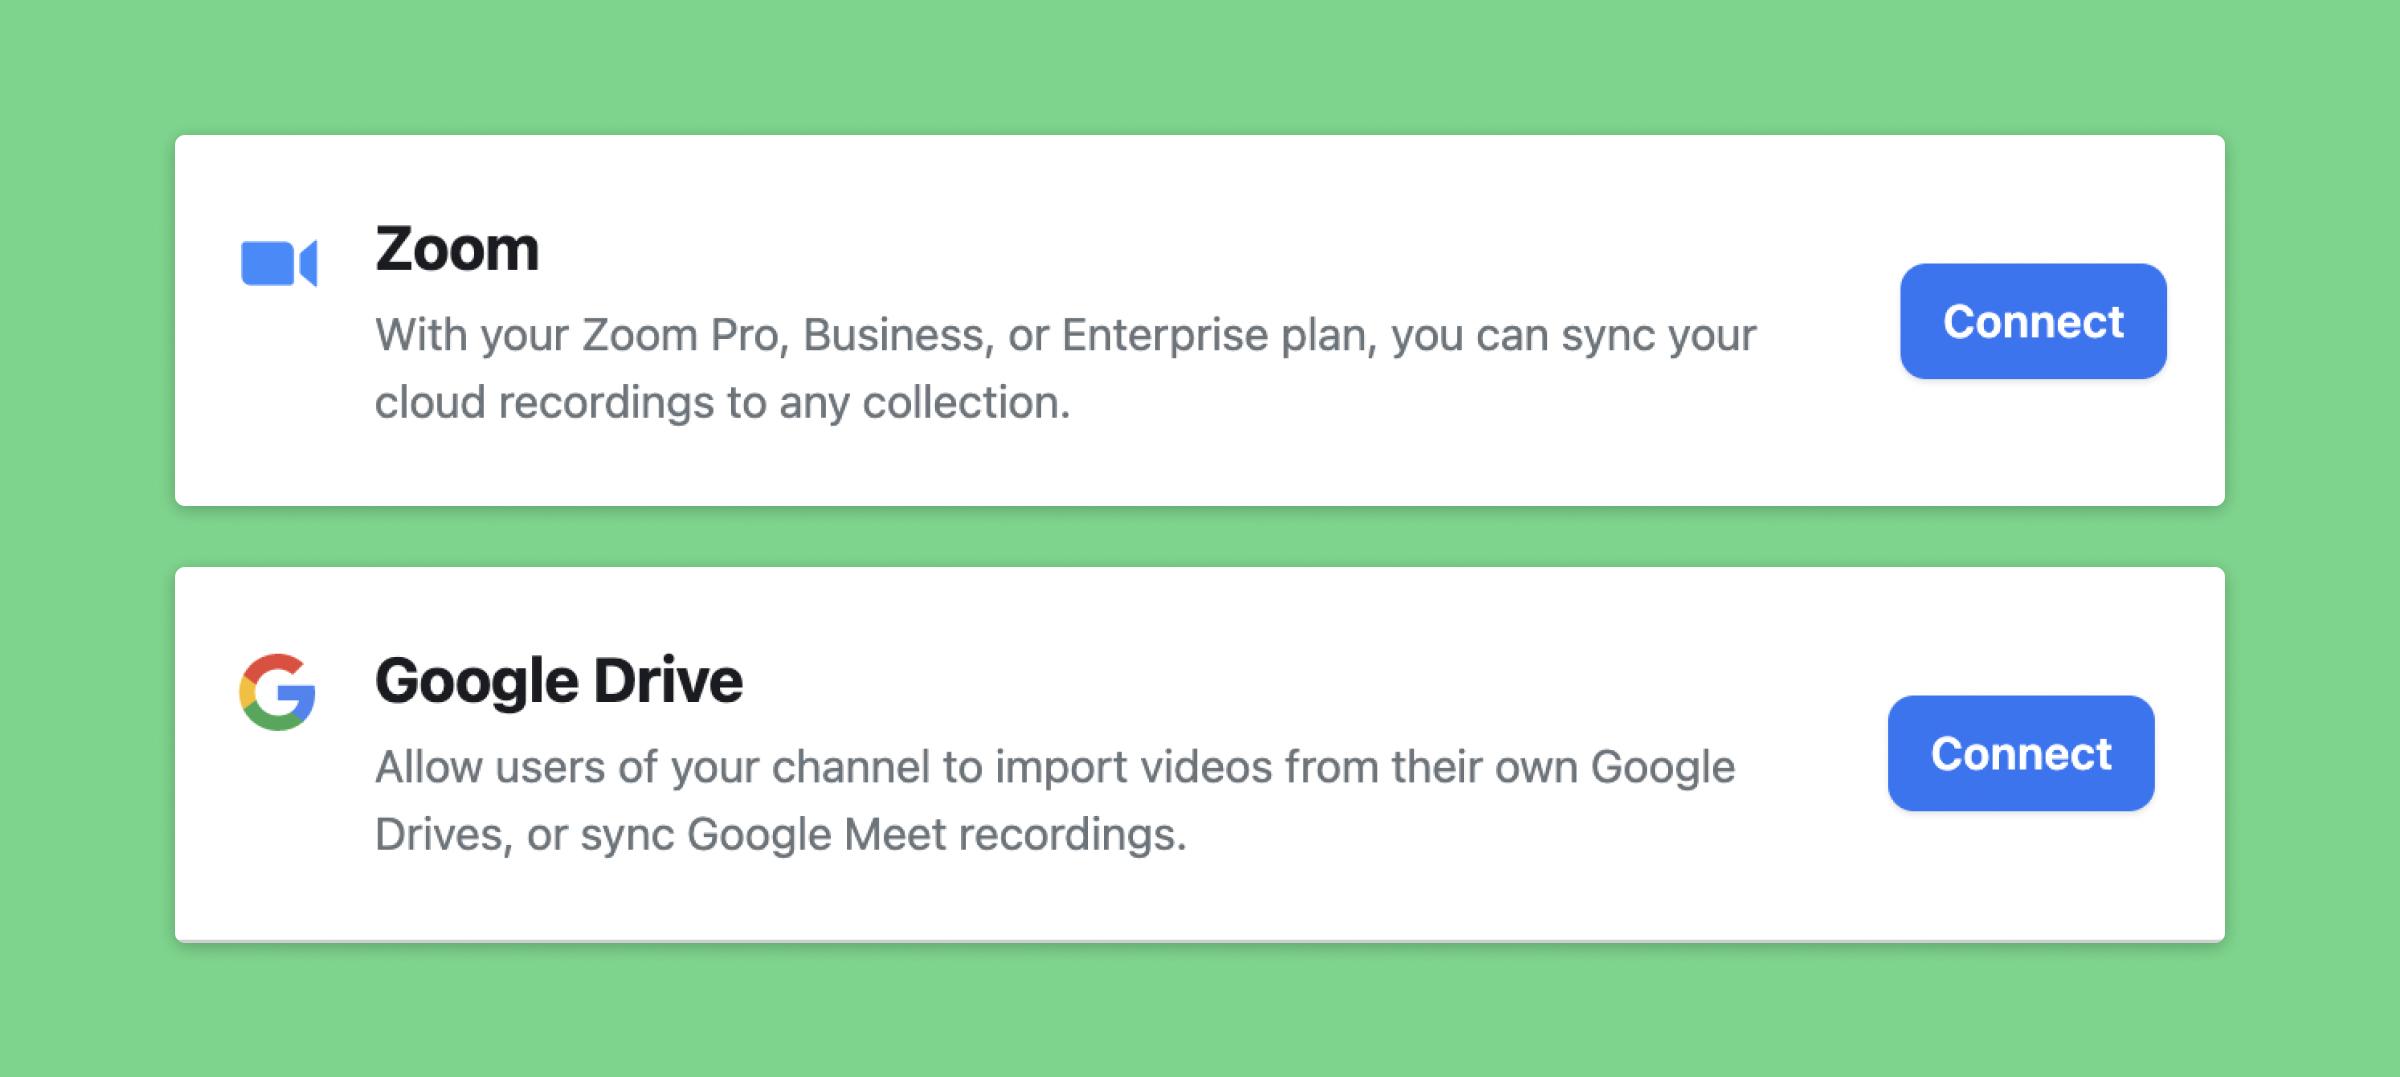 Connect-videoconferencing